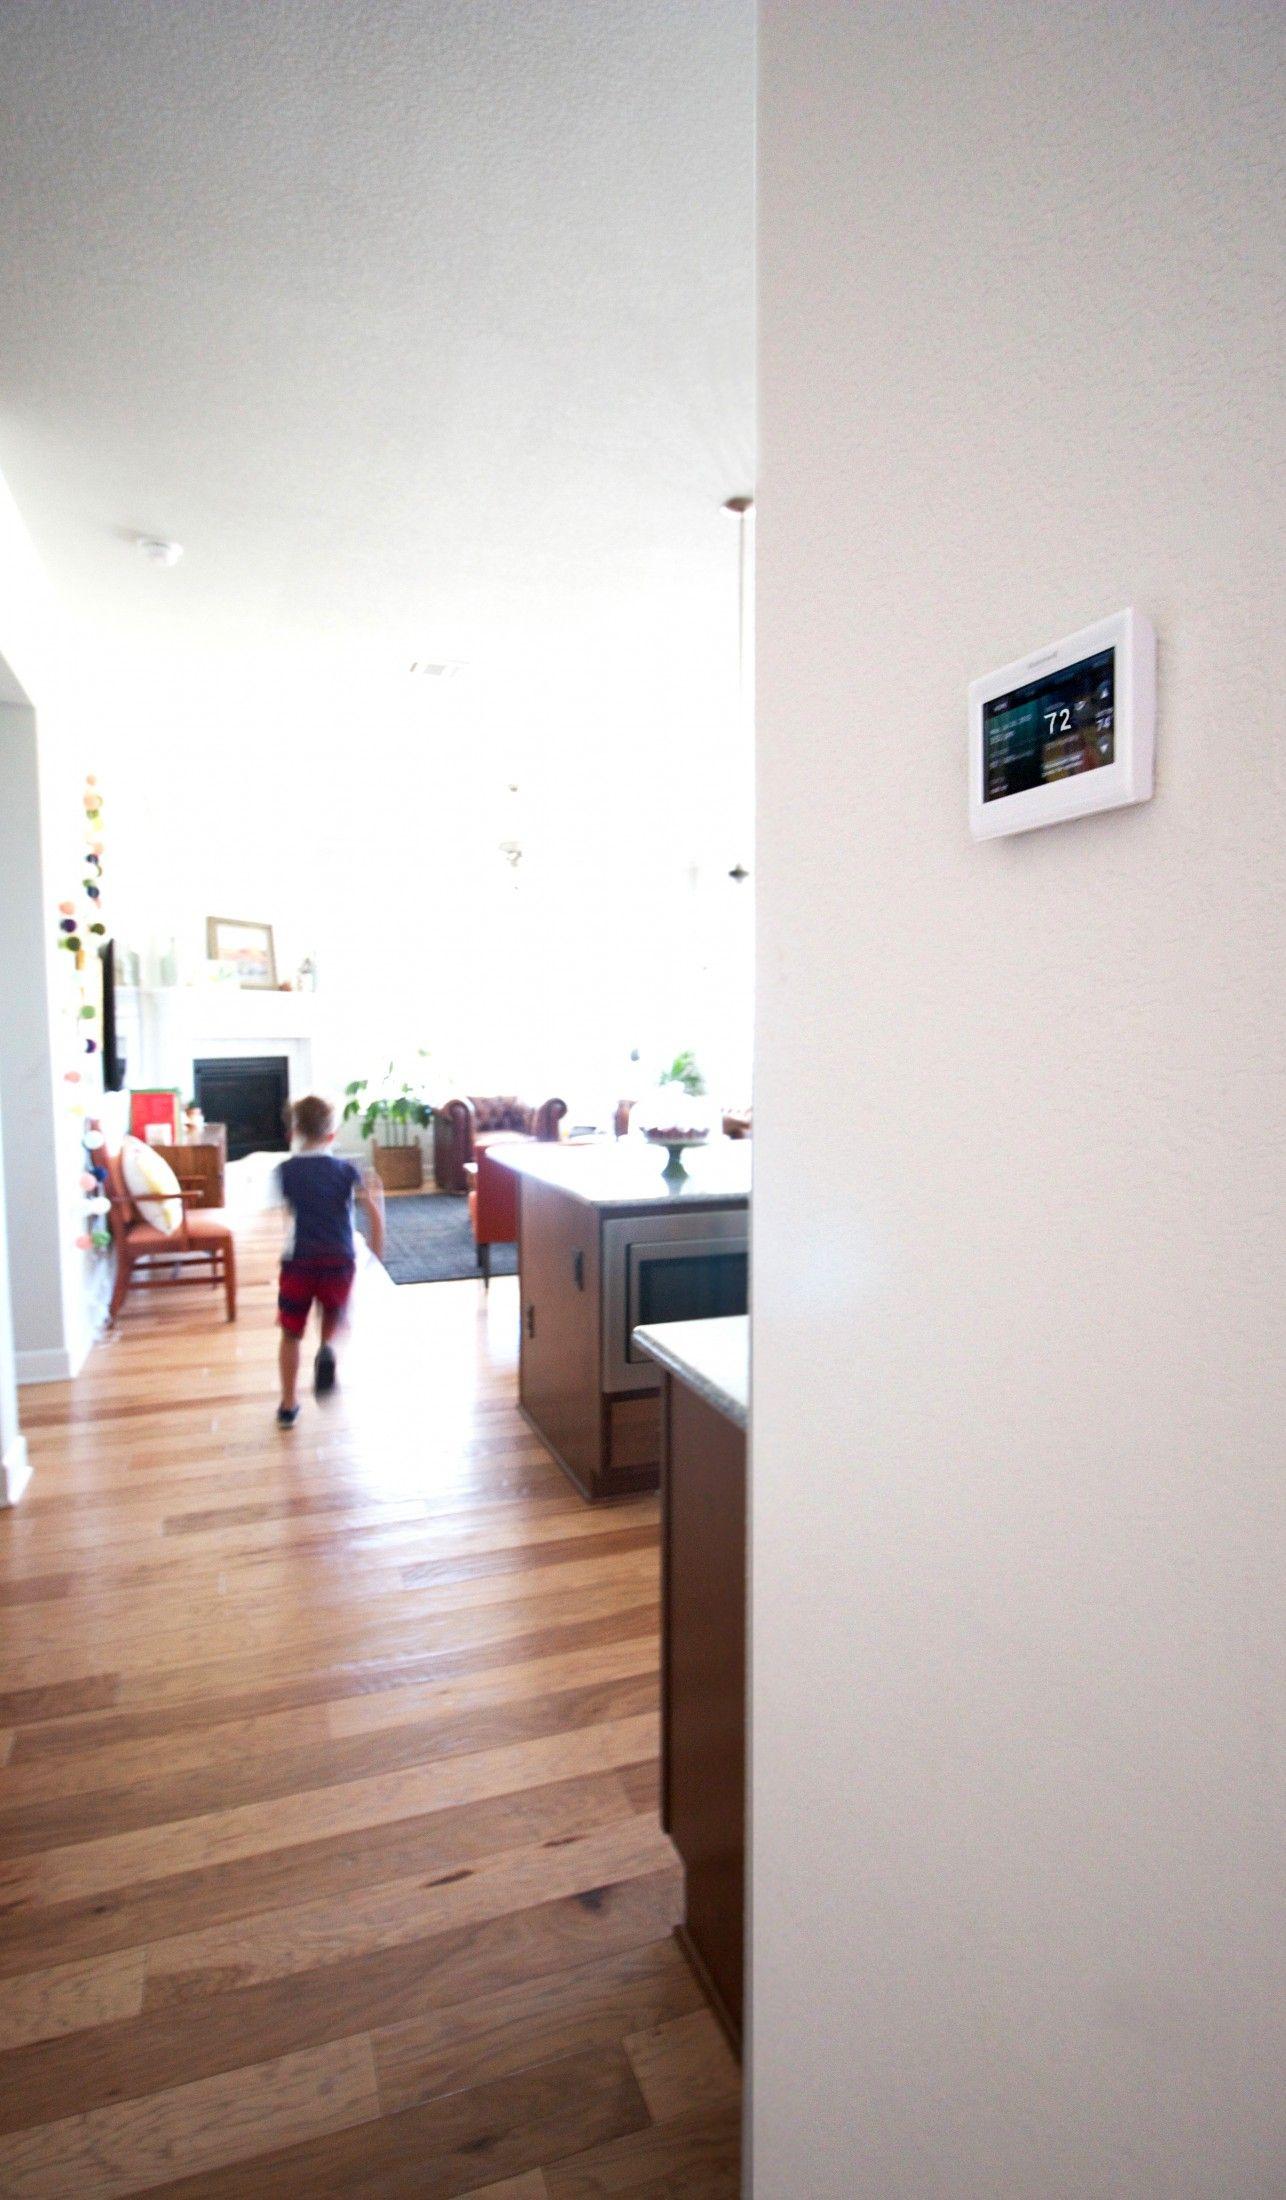 Honeywell WiFi Programmable Thermostats Hardwood floors